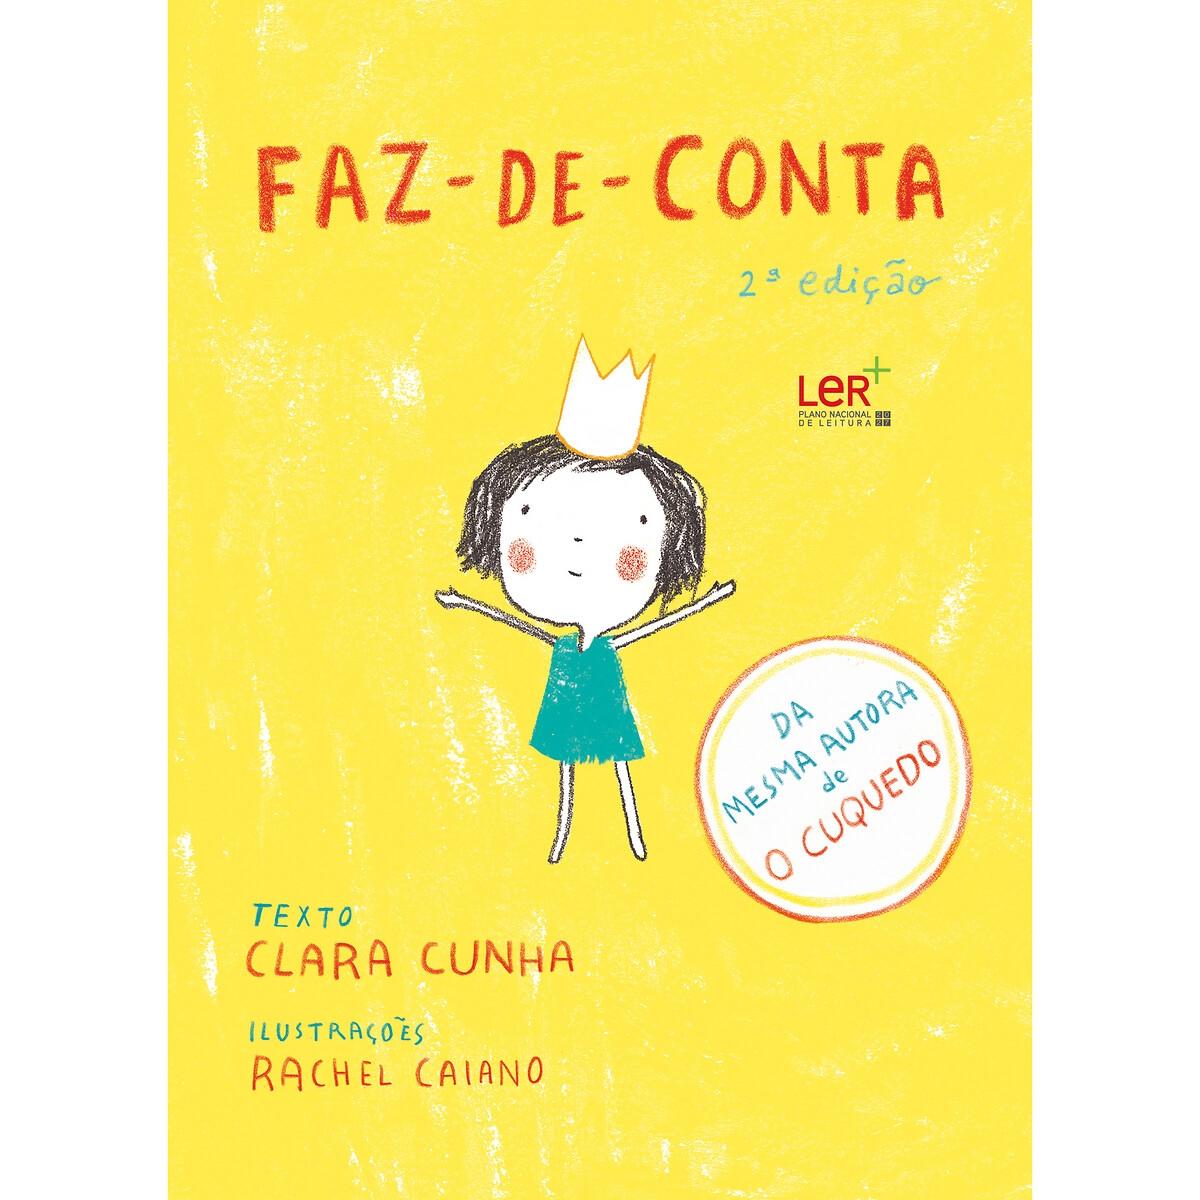 LIVROS HORIZONTE - Livros Horizonte Livro Faz-de-conta